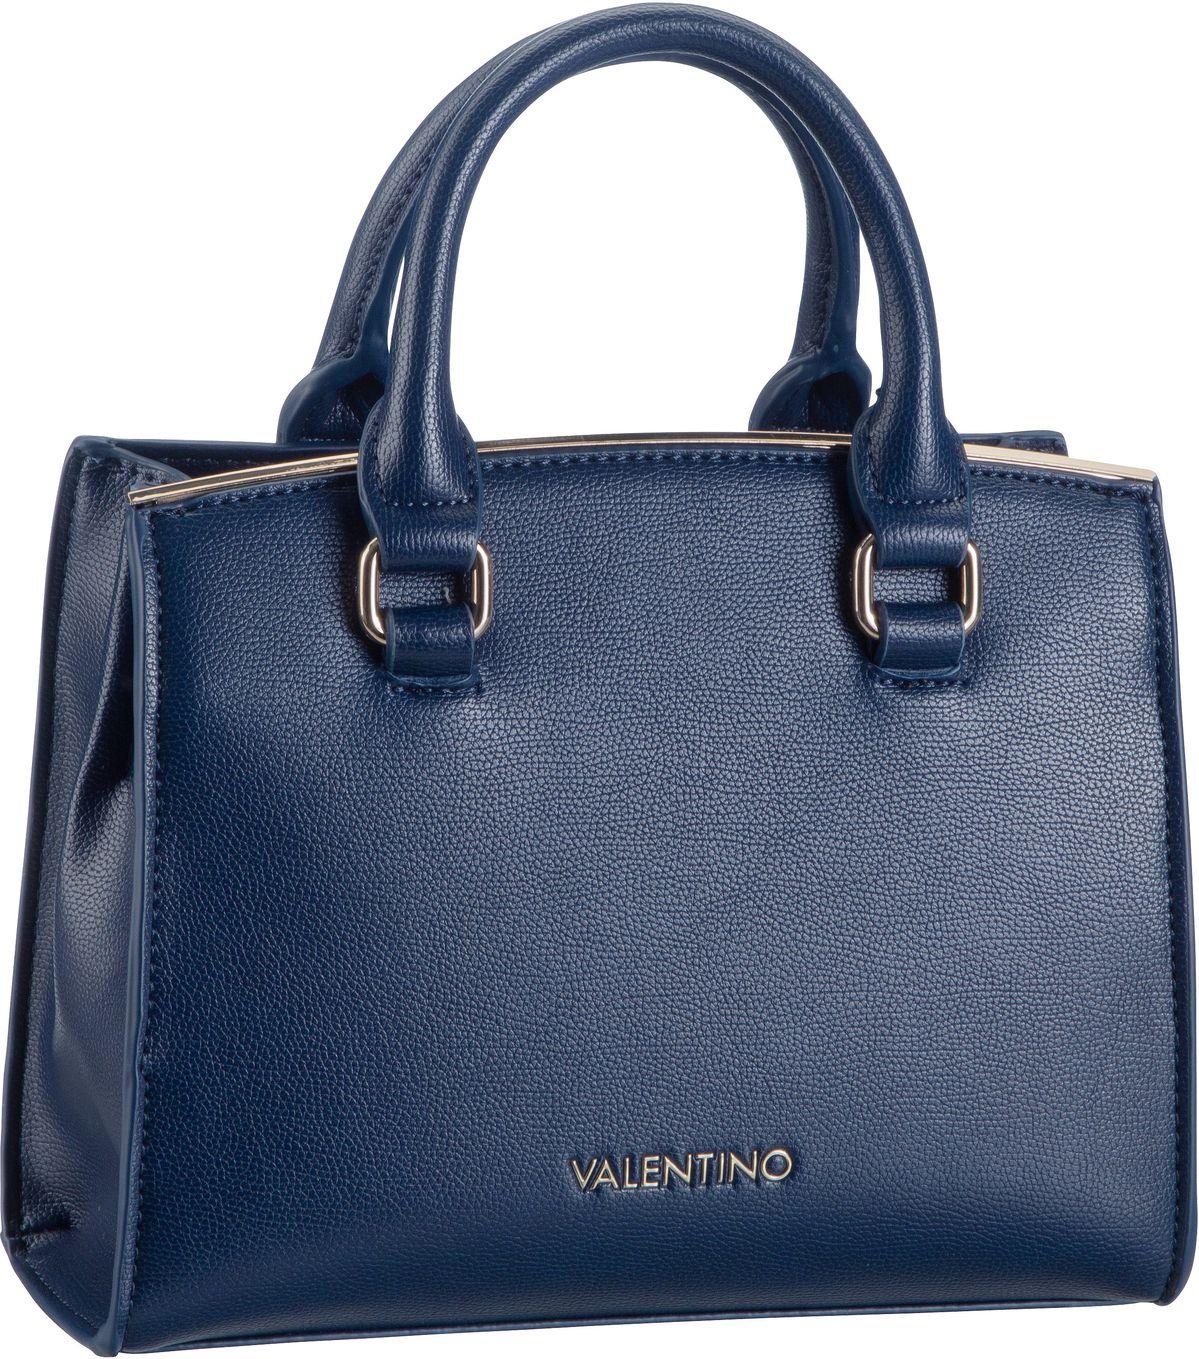 Bags Handtasche Unicorno Shopping T02 Navy